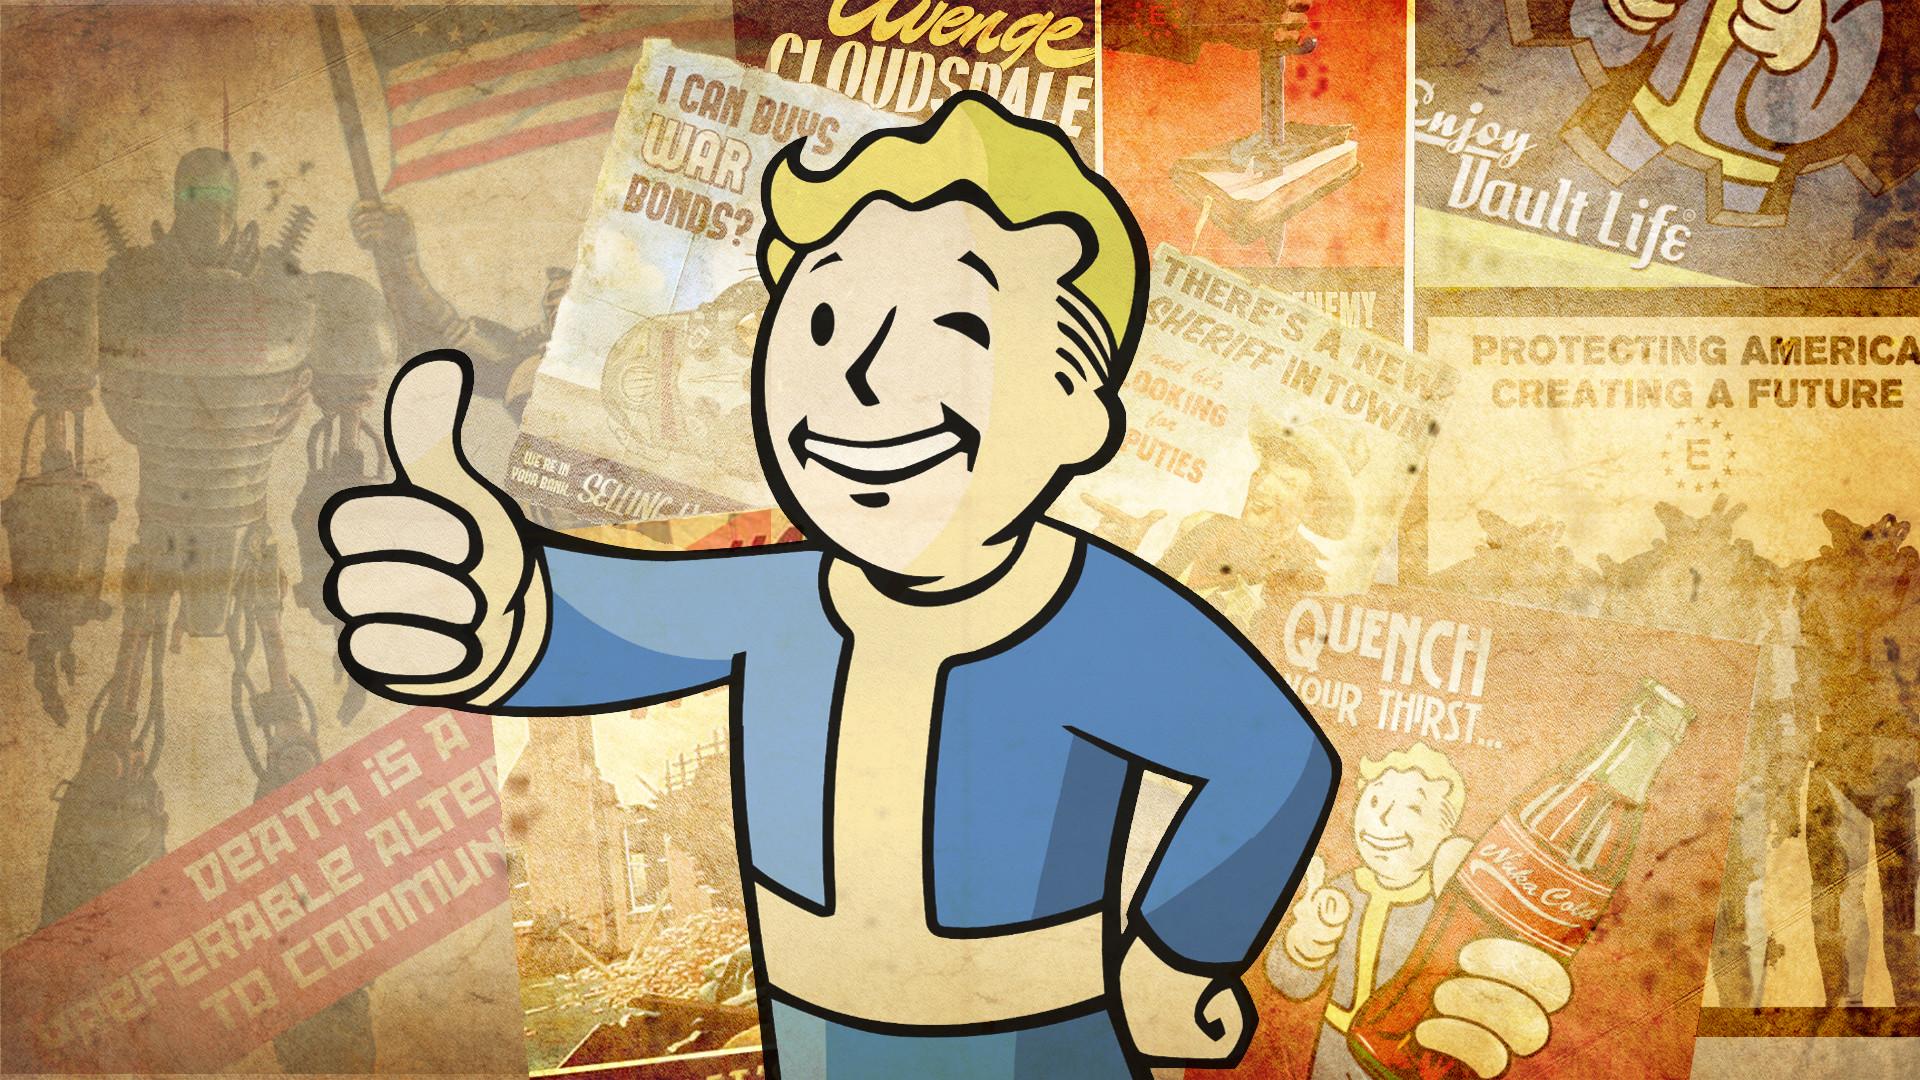 PreviousNext. Previous Image Next Image. wallpaper fallout boy vault …